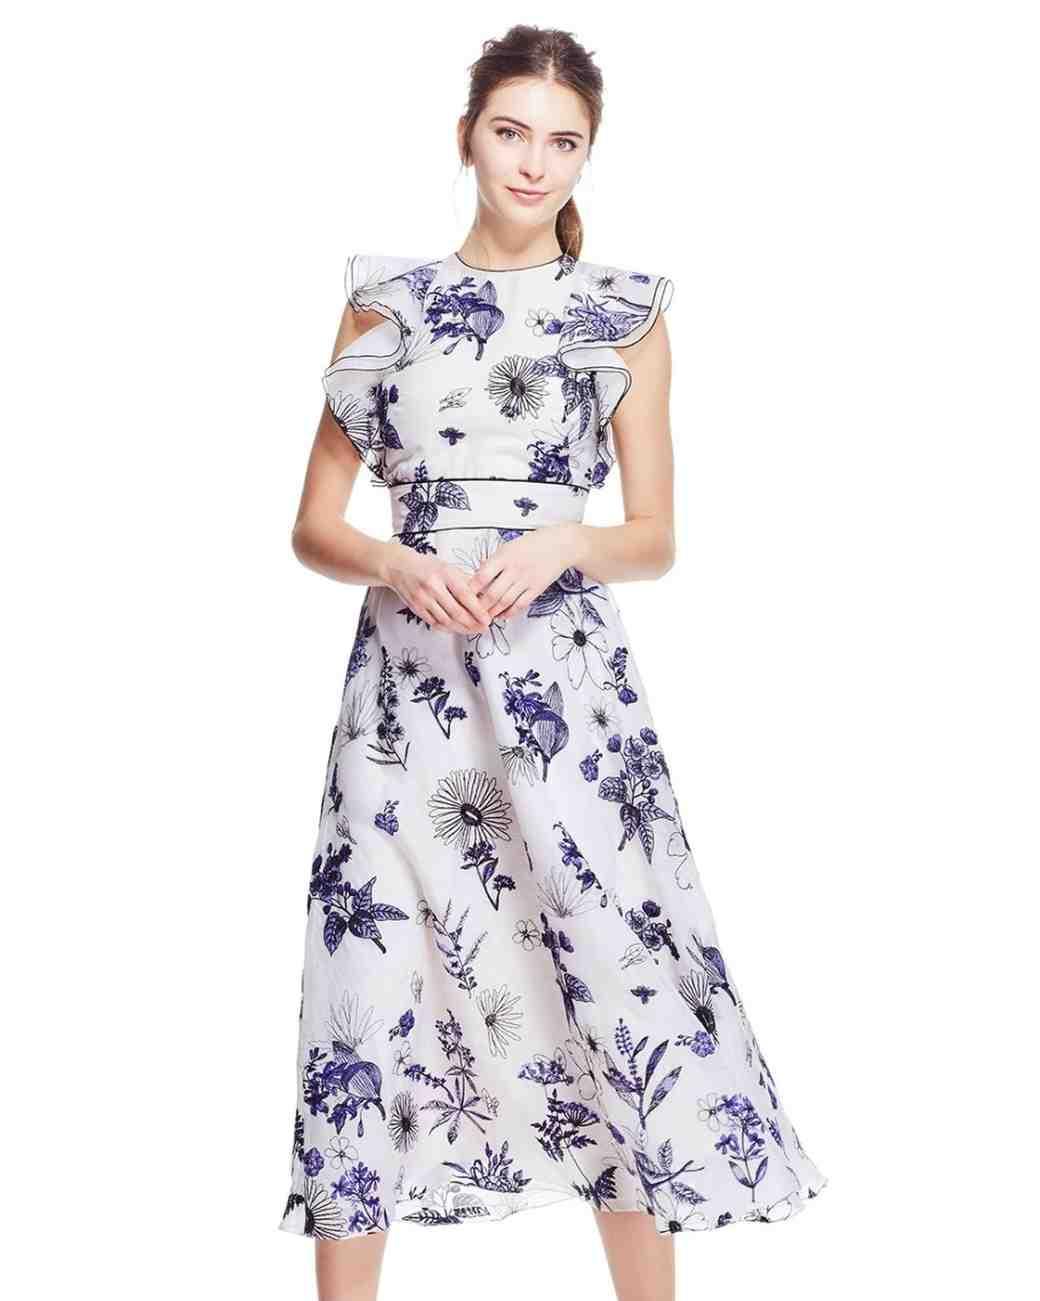 Summer Mother of the Bride Dresses, Blue and White Lela Rose Dress